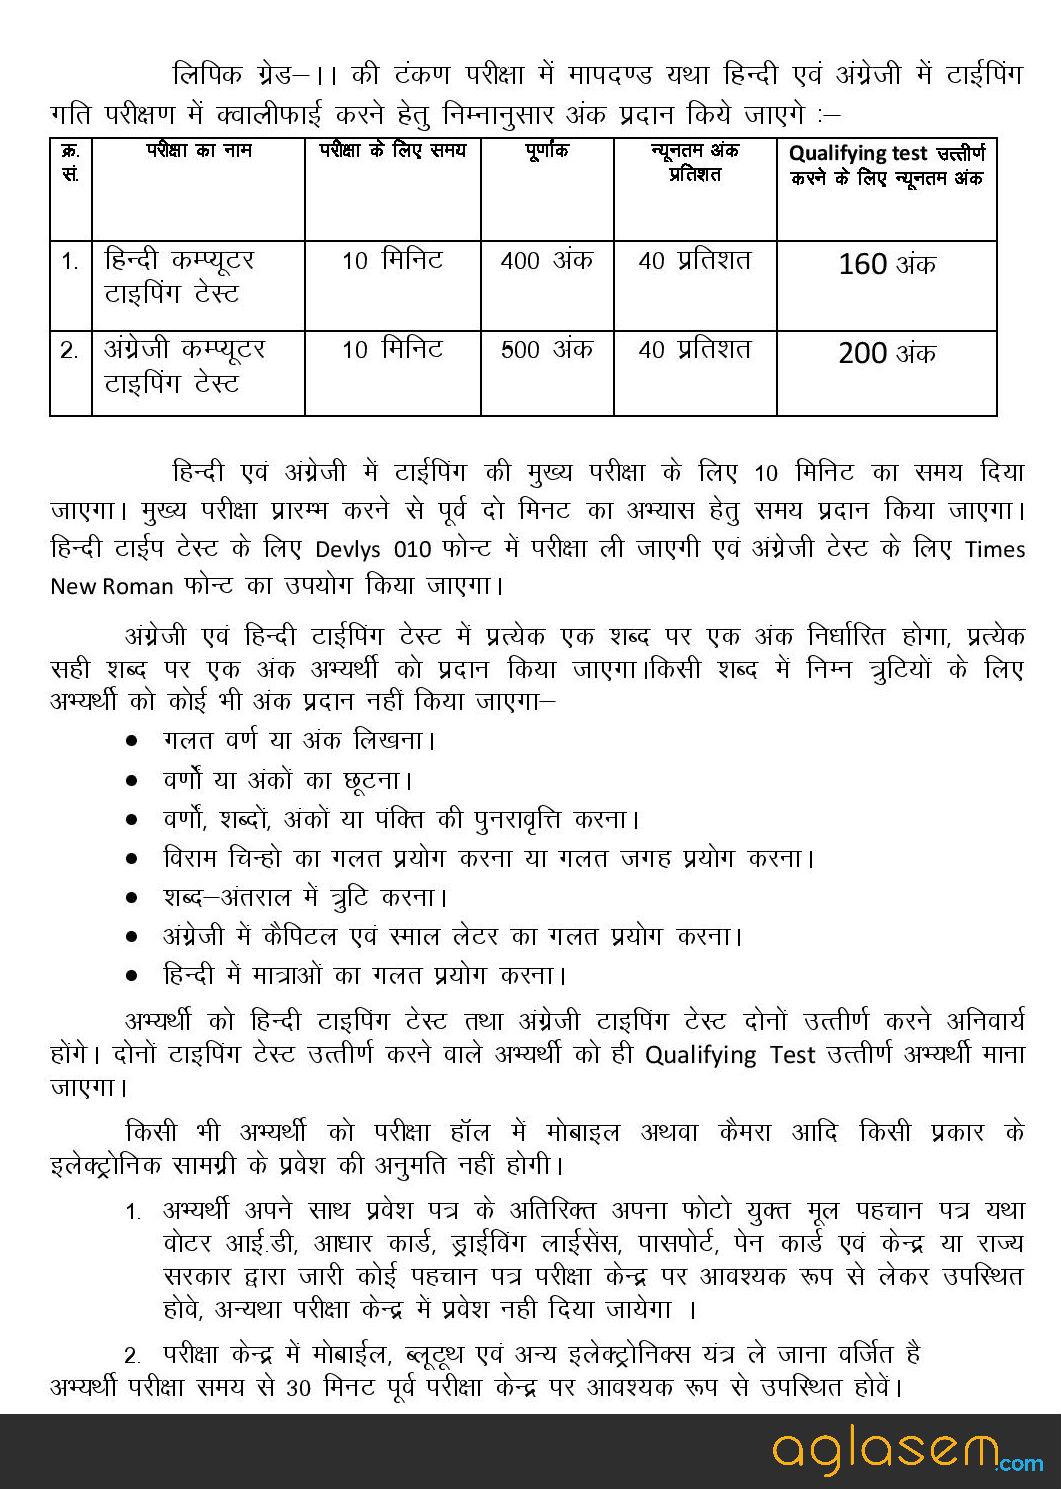 Rajasthan Nagar Palika Recruitment 2016   CMAR Recruitment